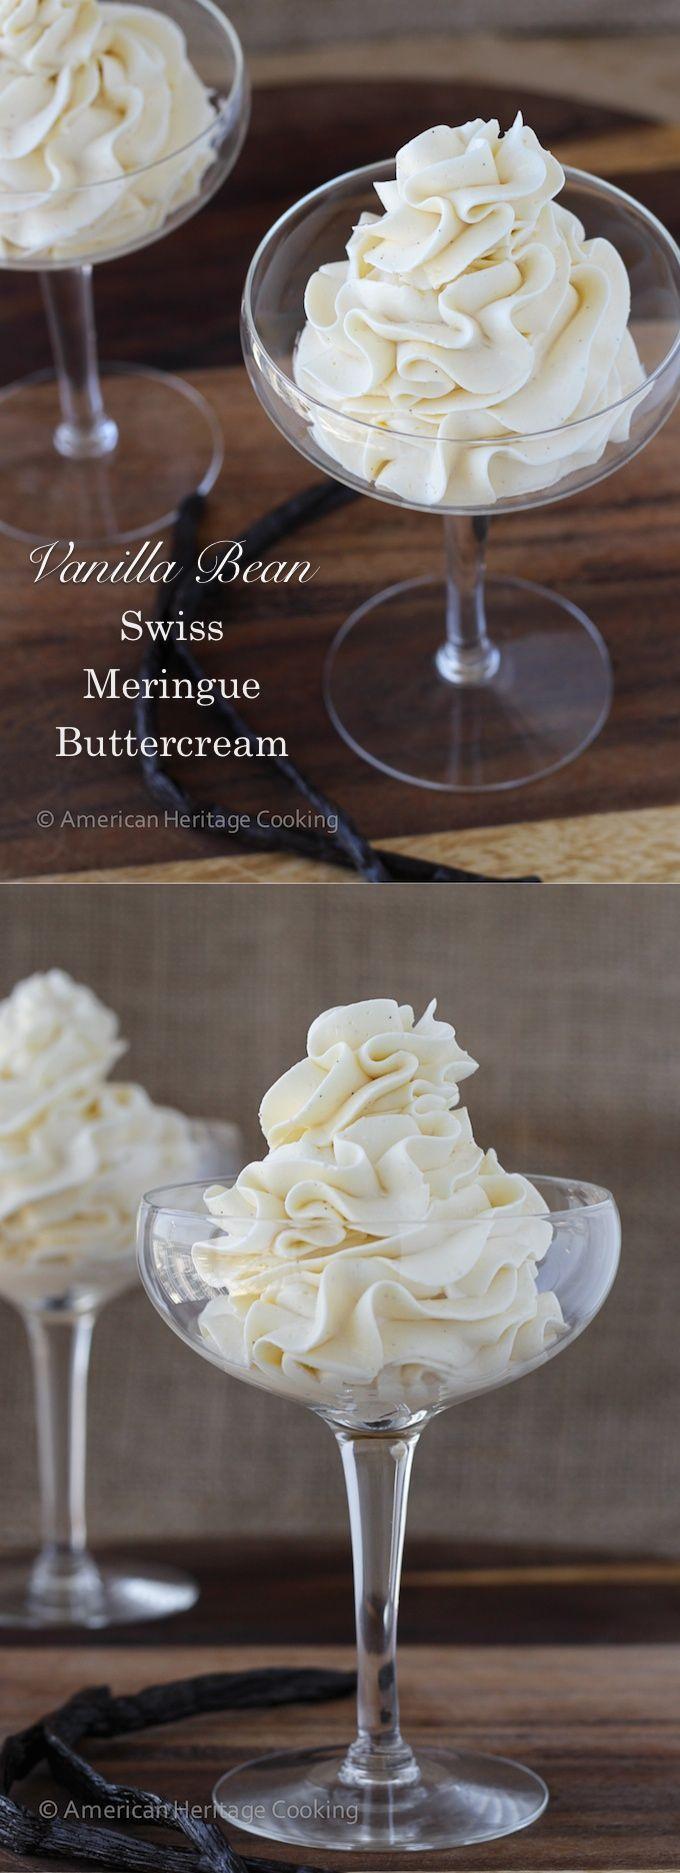 Vanilla Bean Swiss Meringue Buttercream Frosting - American Heritage Cooking